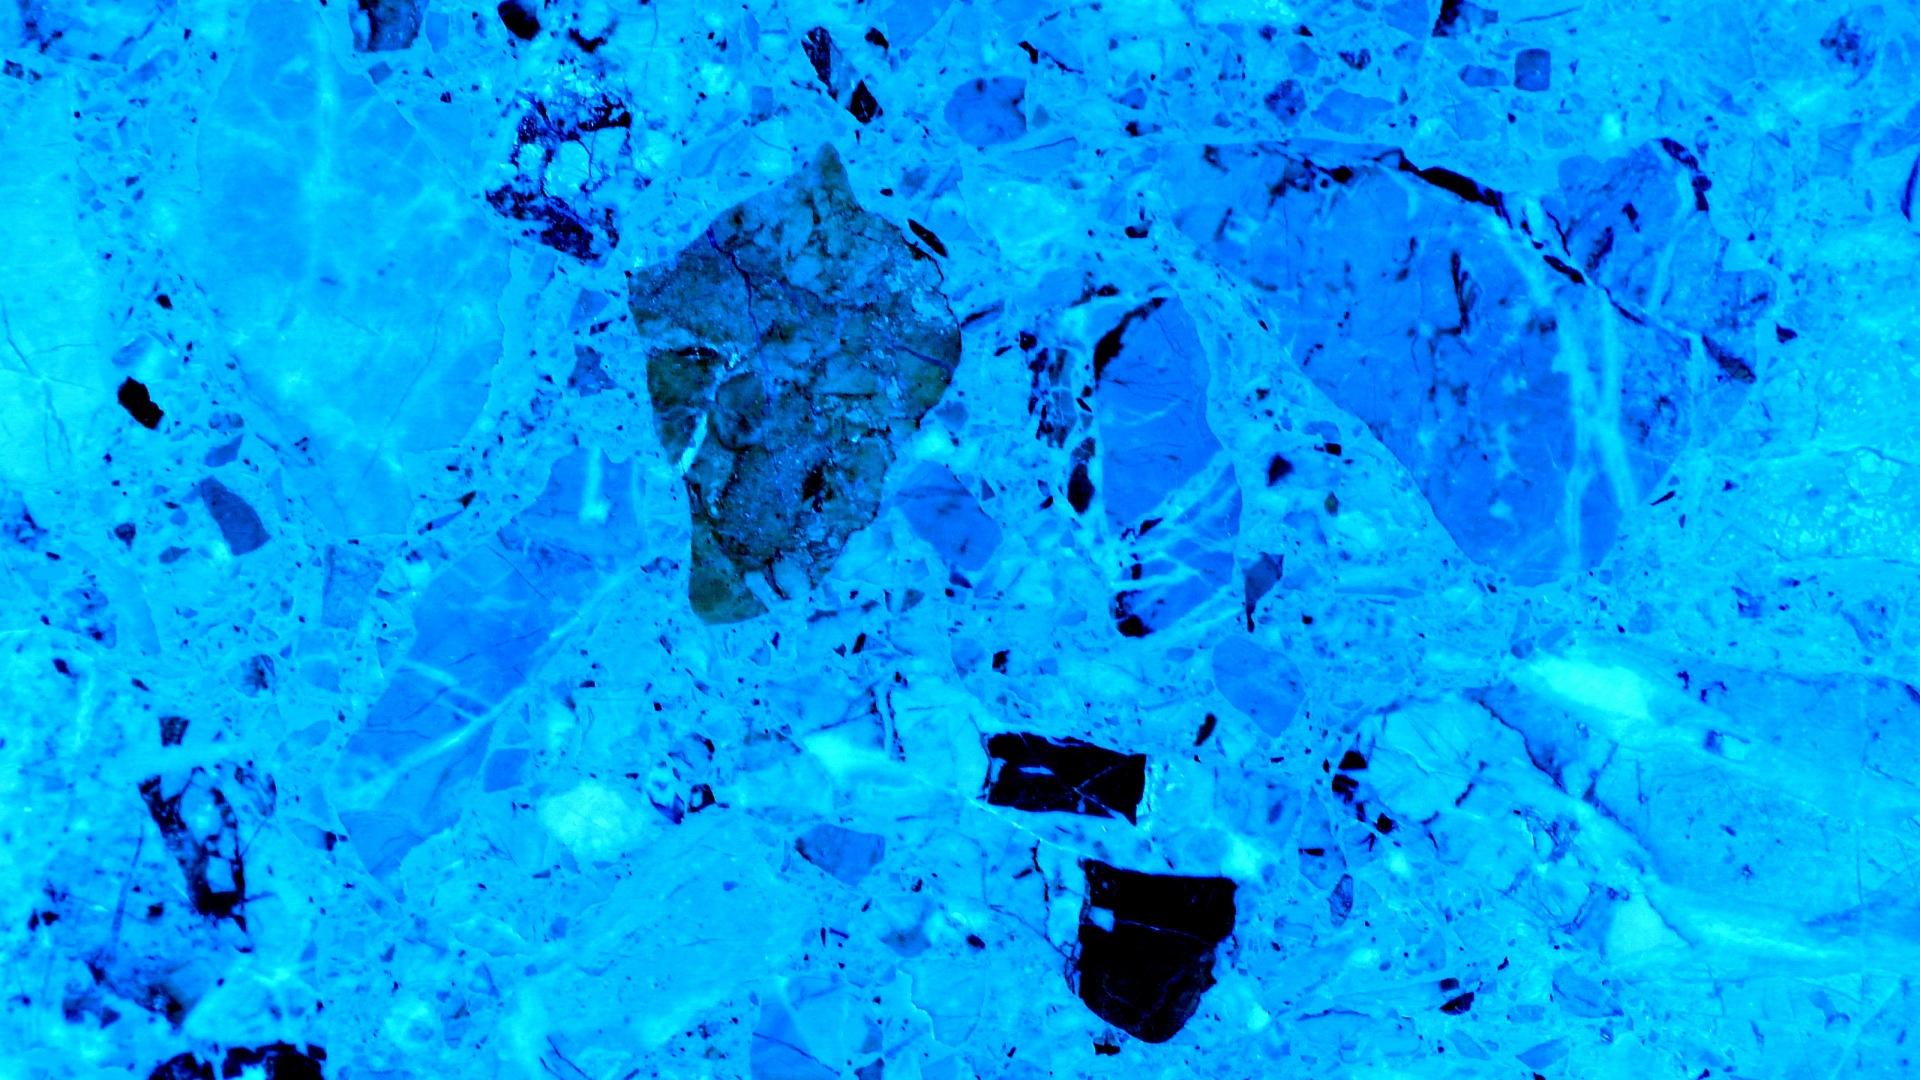 Pattern Wallpaper Hd Blue Marble Background Free Stock Photo Public Domain